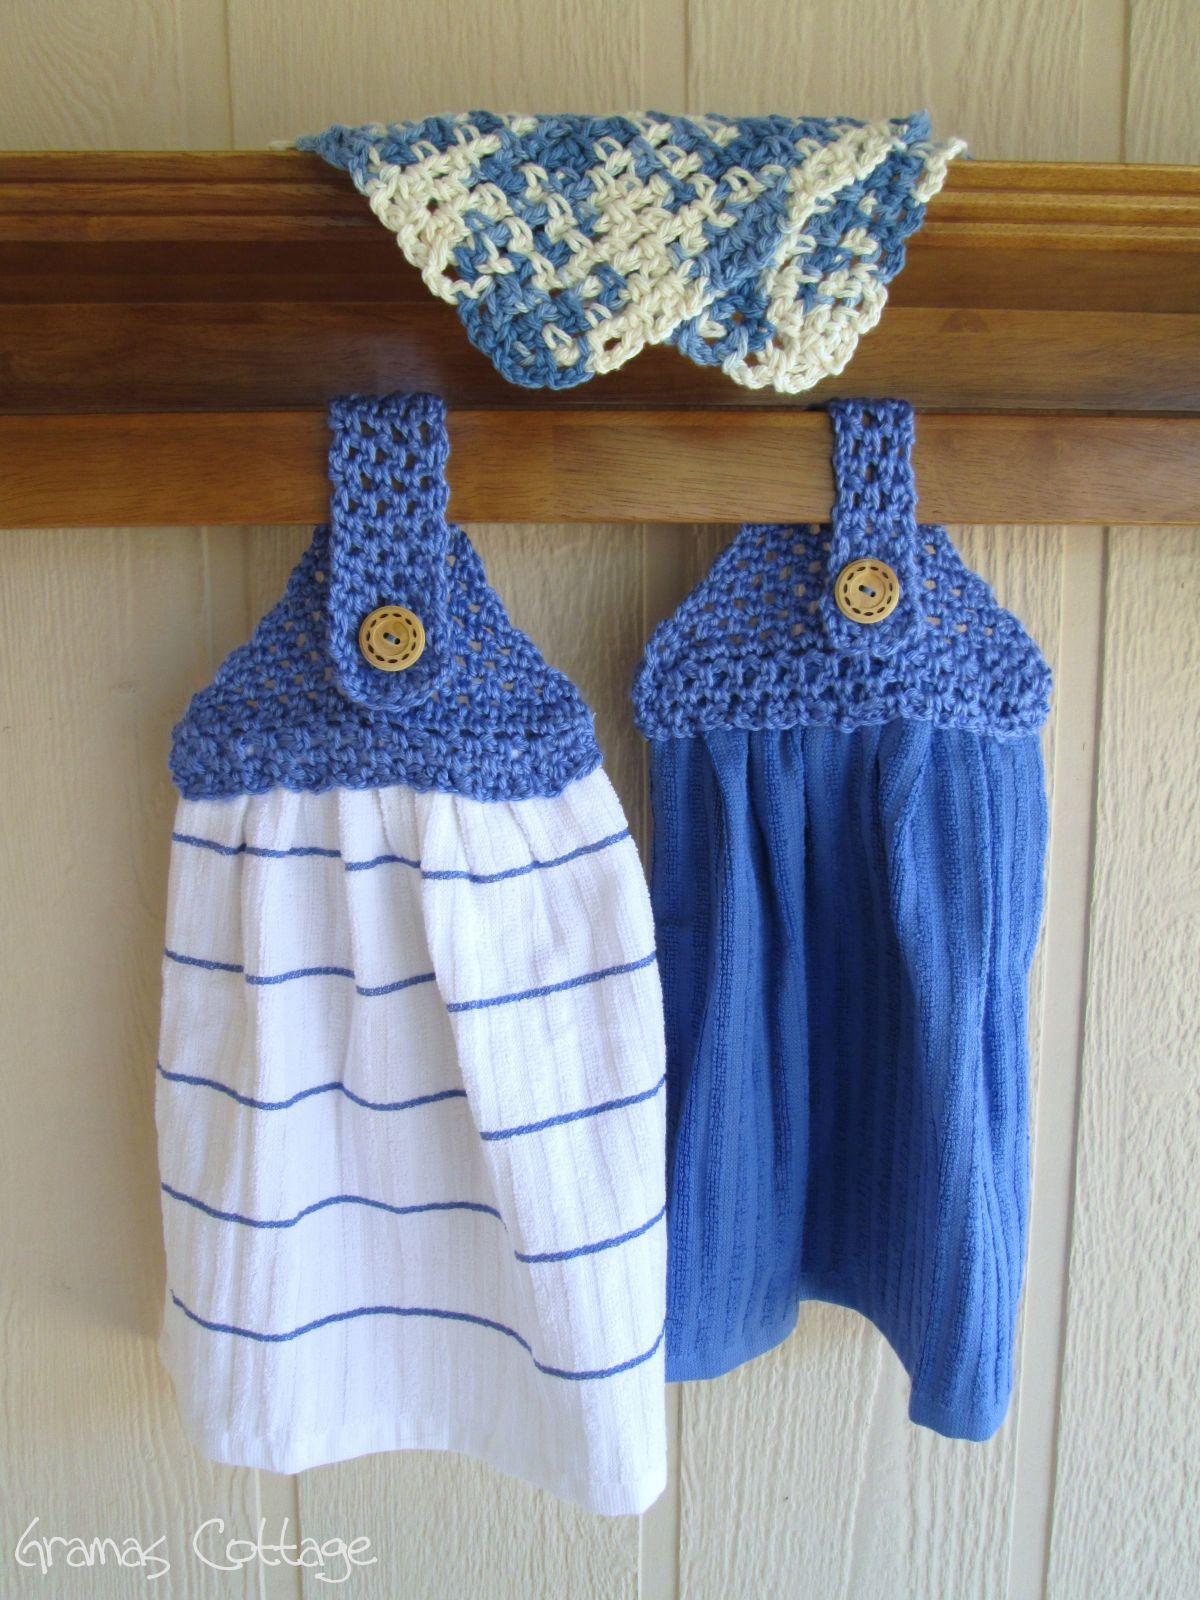 Crochet Patterns Kitchen Towels : Hand Crochet Kitchen Towels Crochet Pinterest